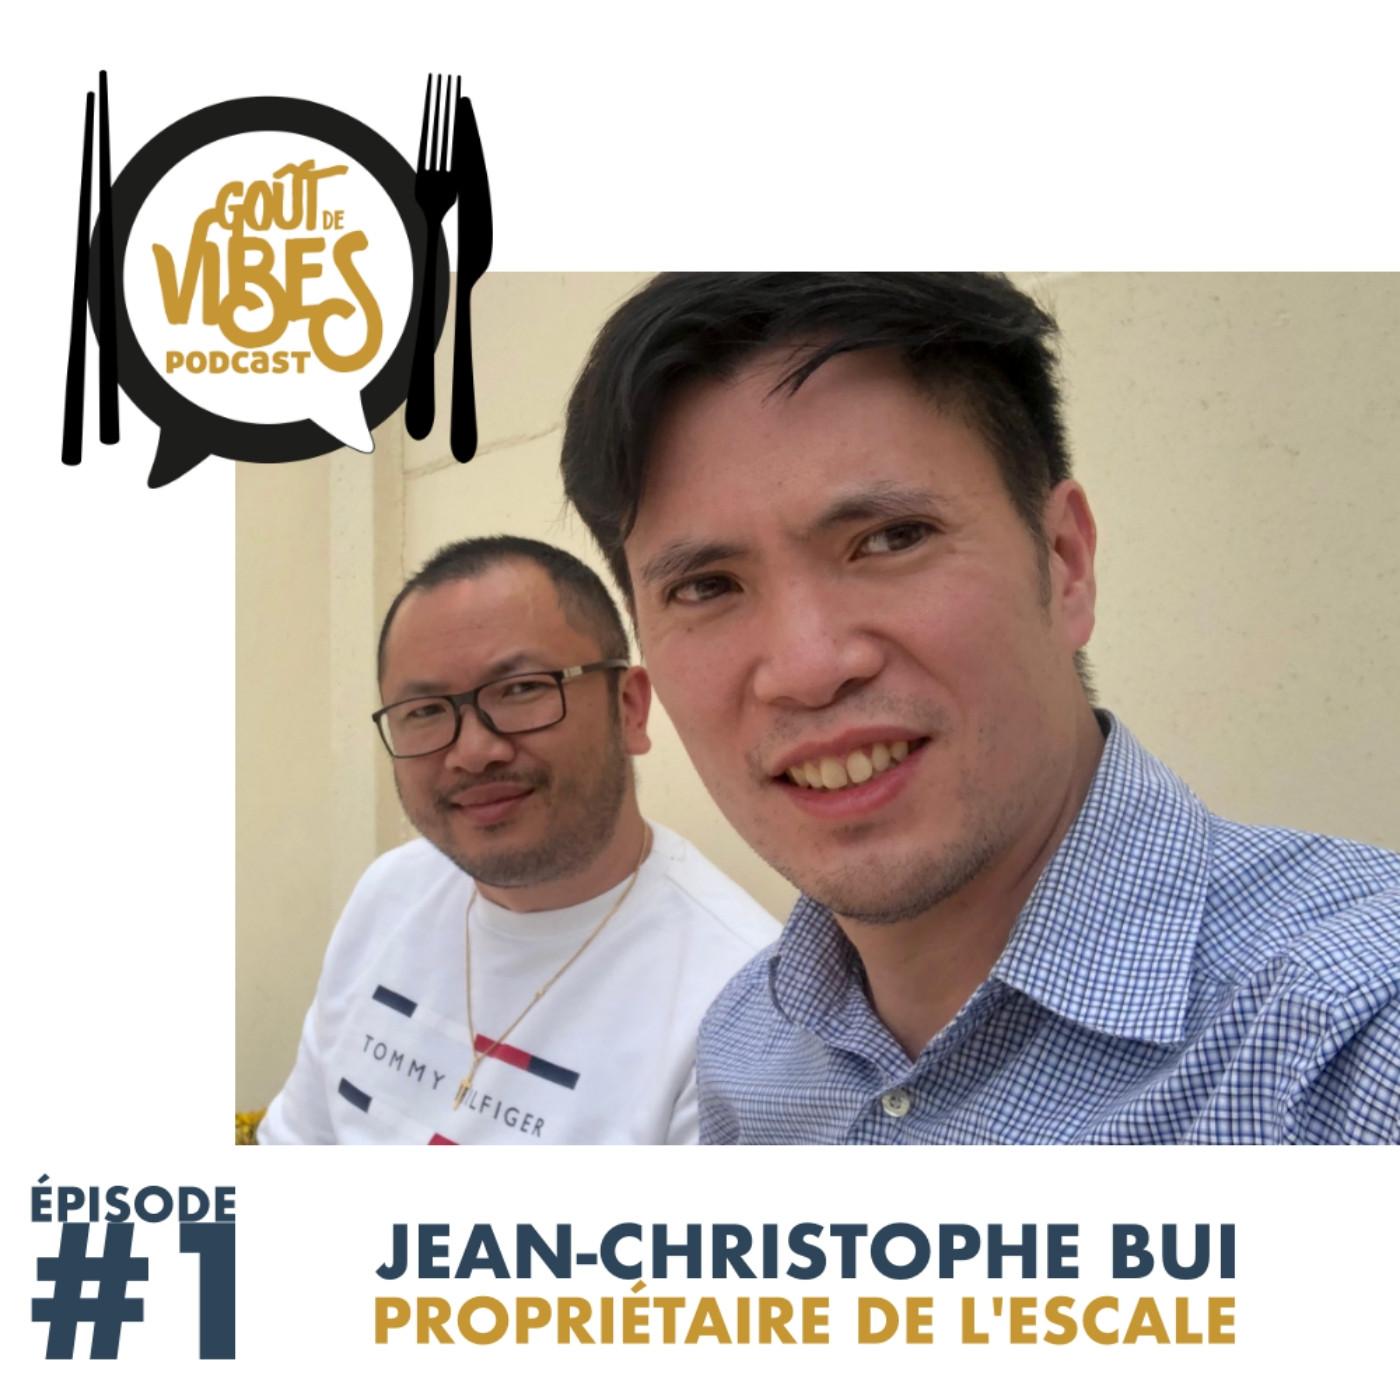 (#1) Jean-Christophe Bui, propriétaire du café-restaurant L'Escale de Jossigny